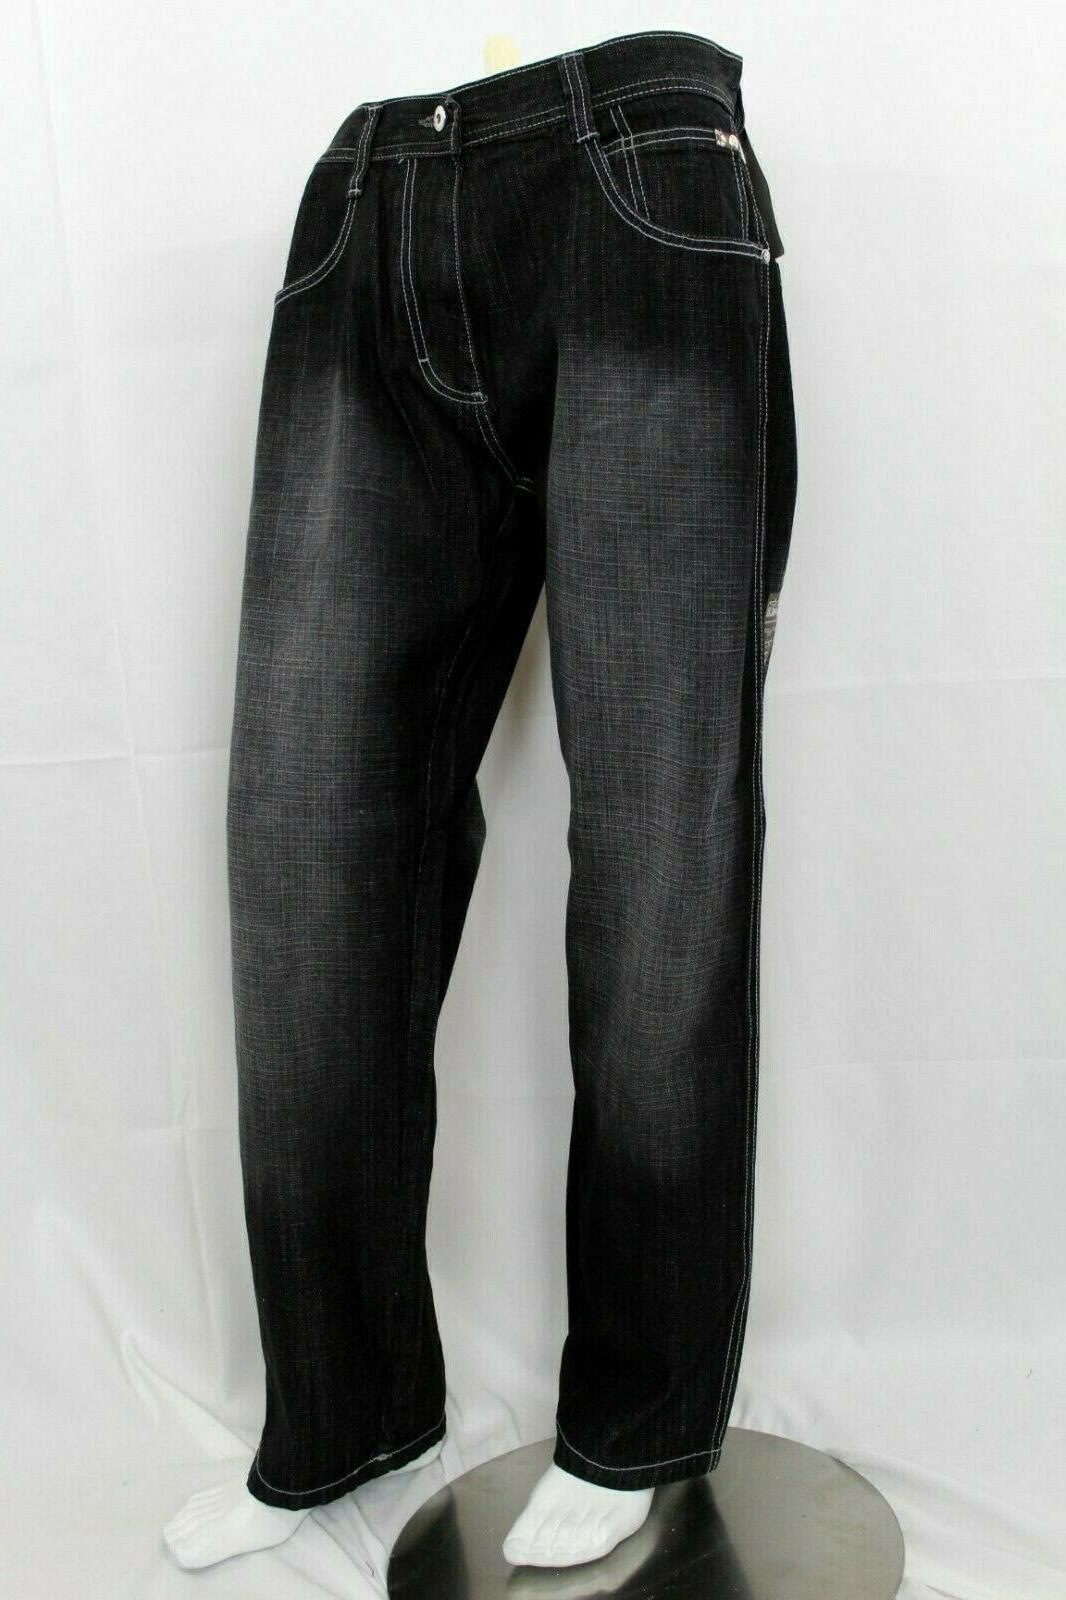 Men Pants 9007-4180 Relaxed Big &Tall